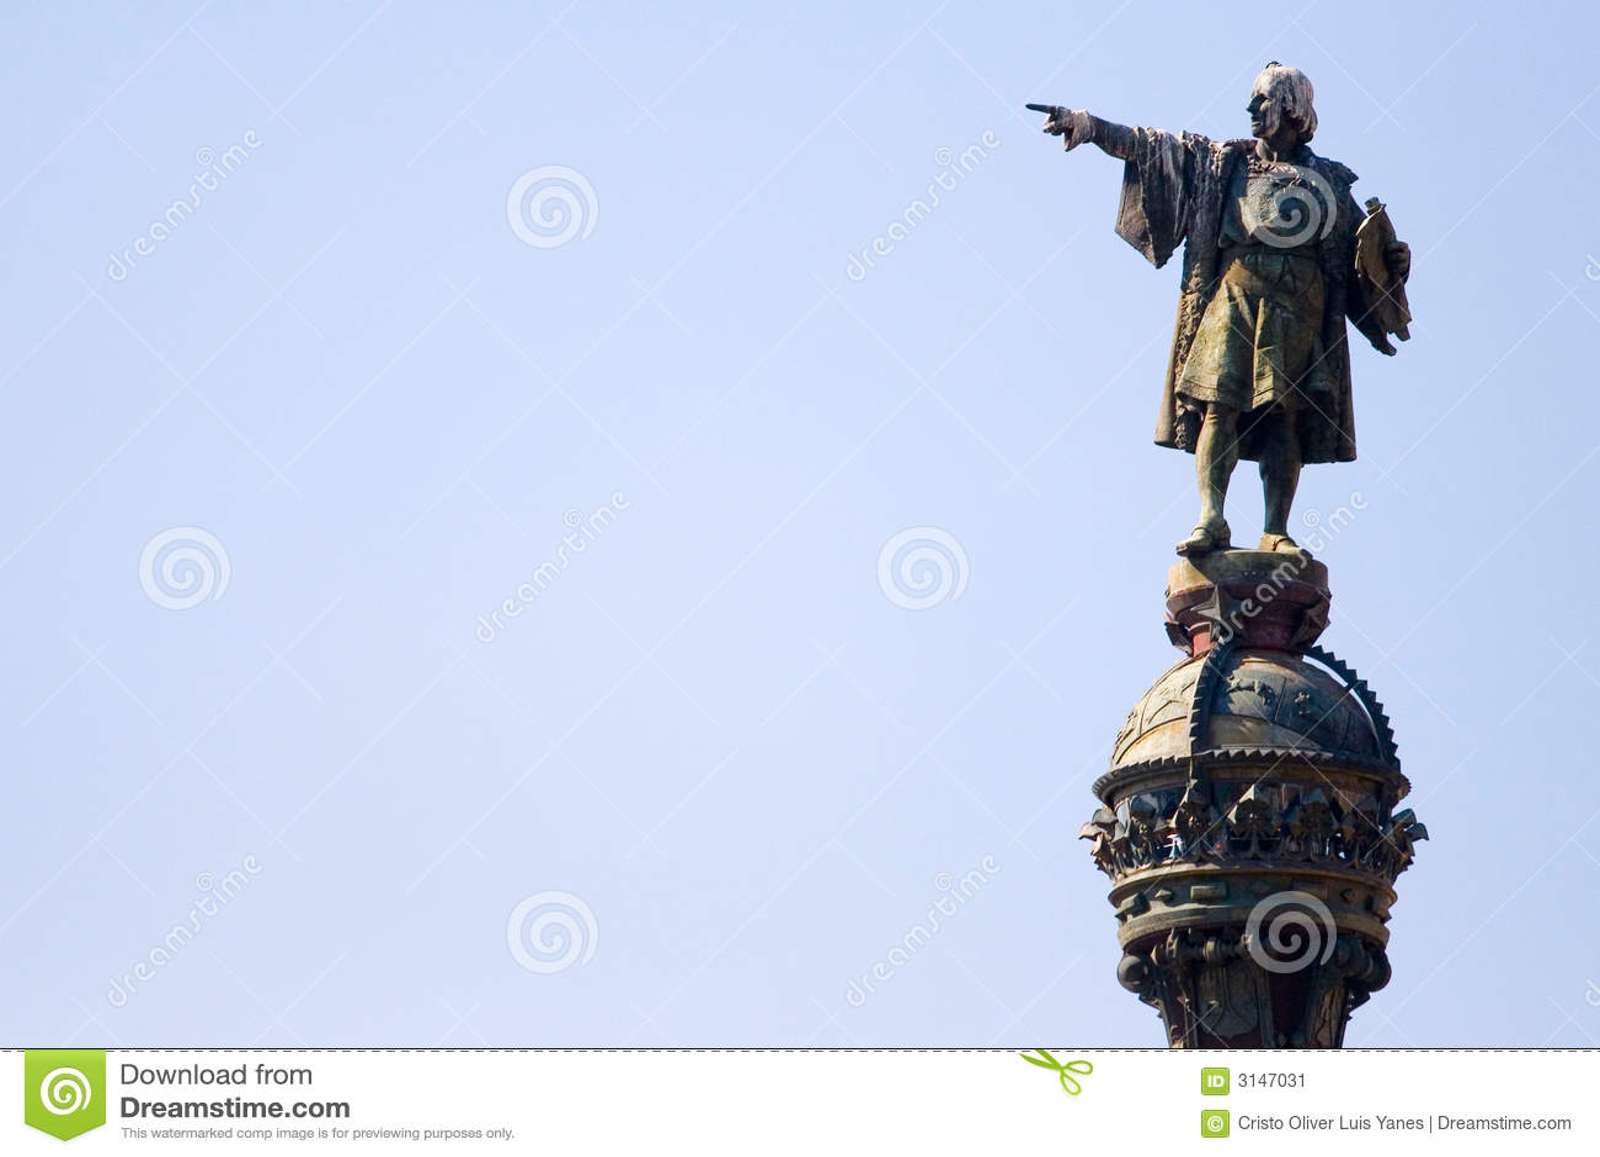 Христофор columbus